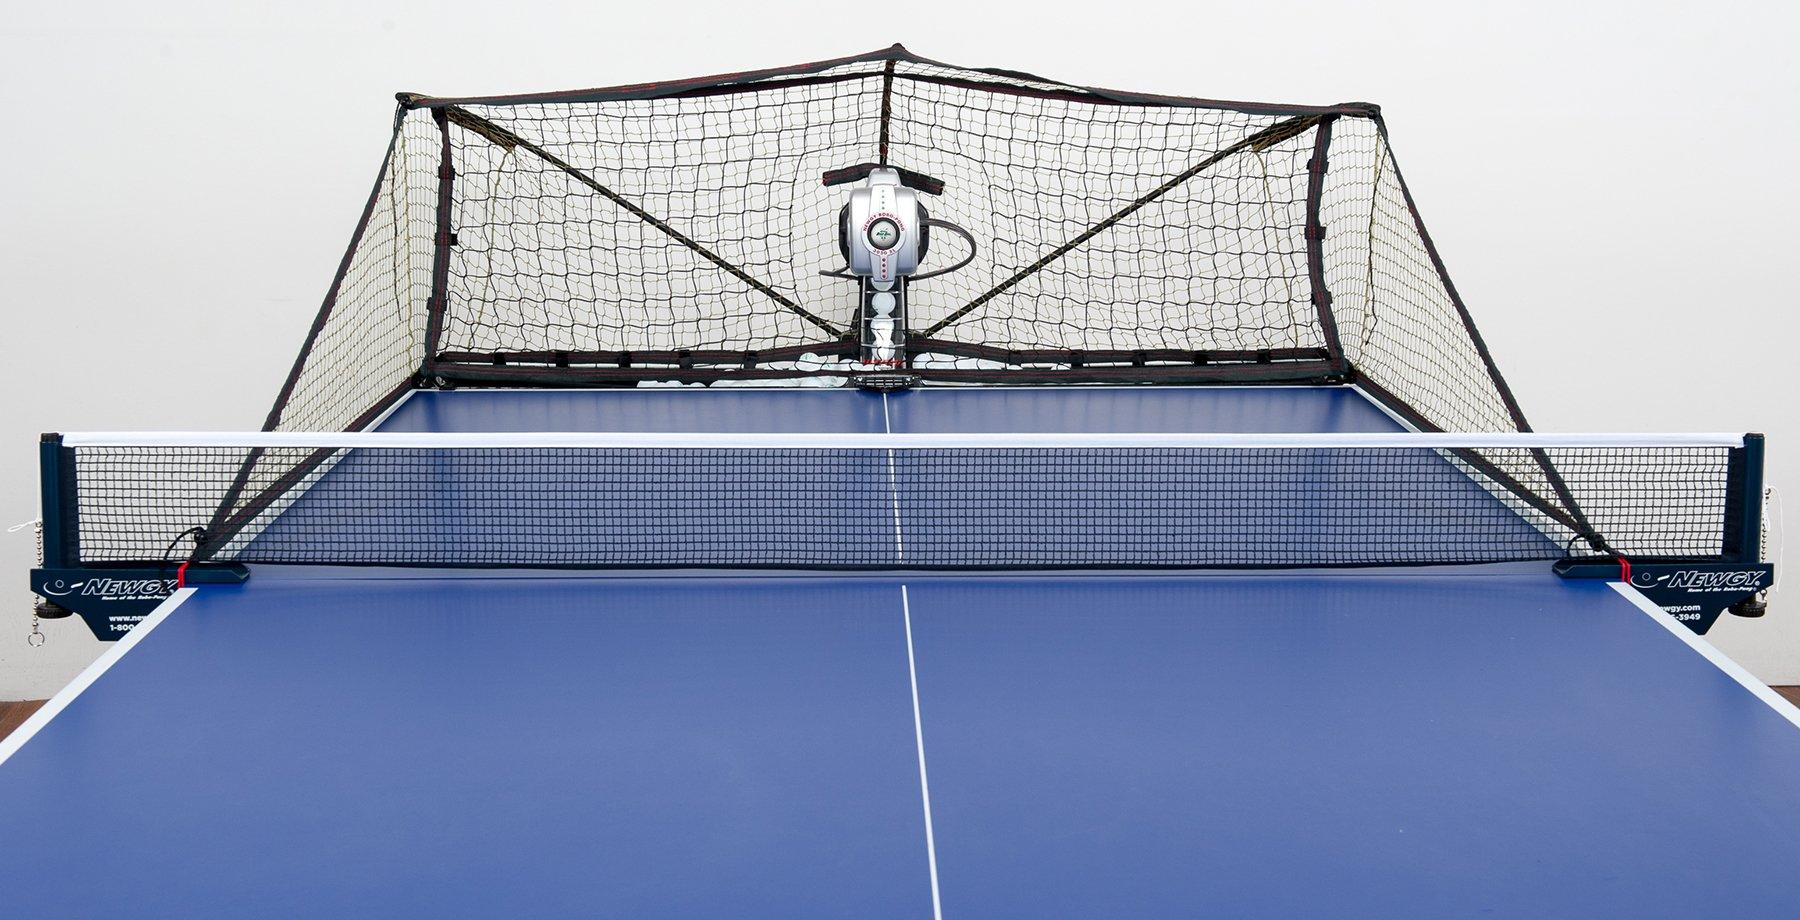 Newgy Robopong 3050XL Table Tennis Machine